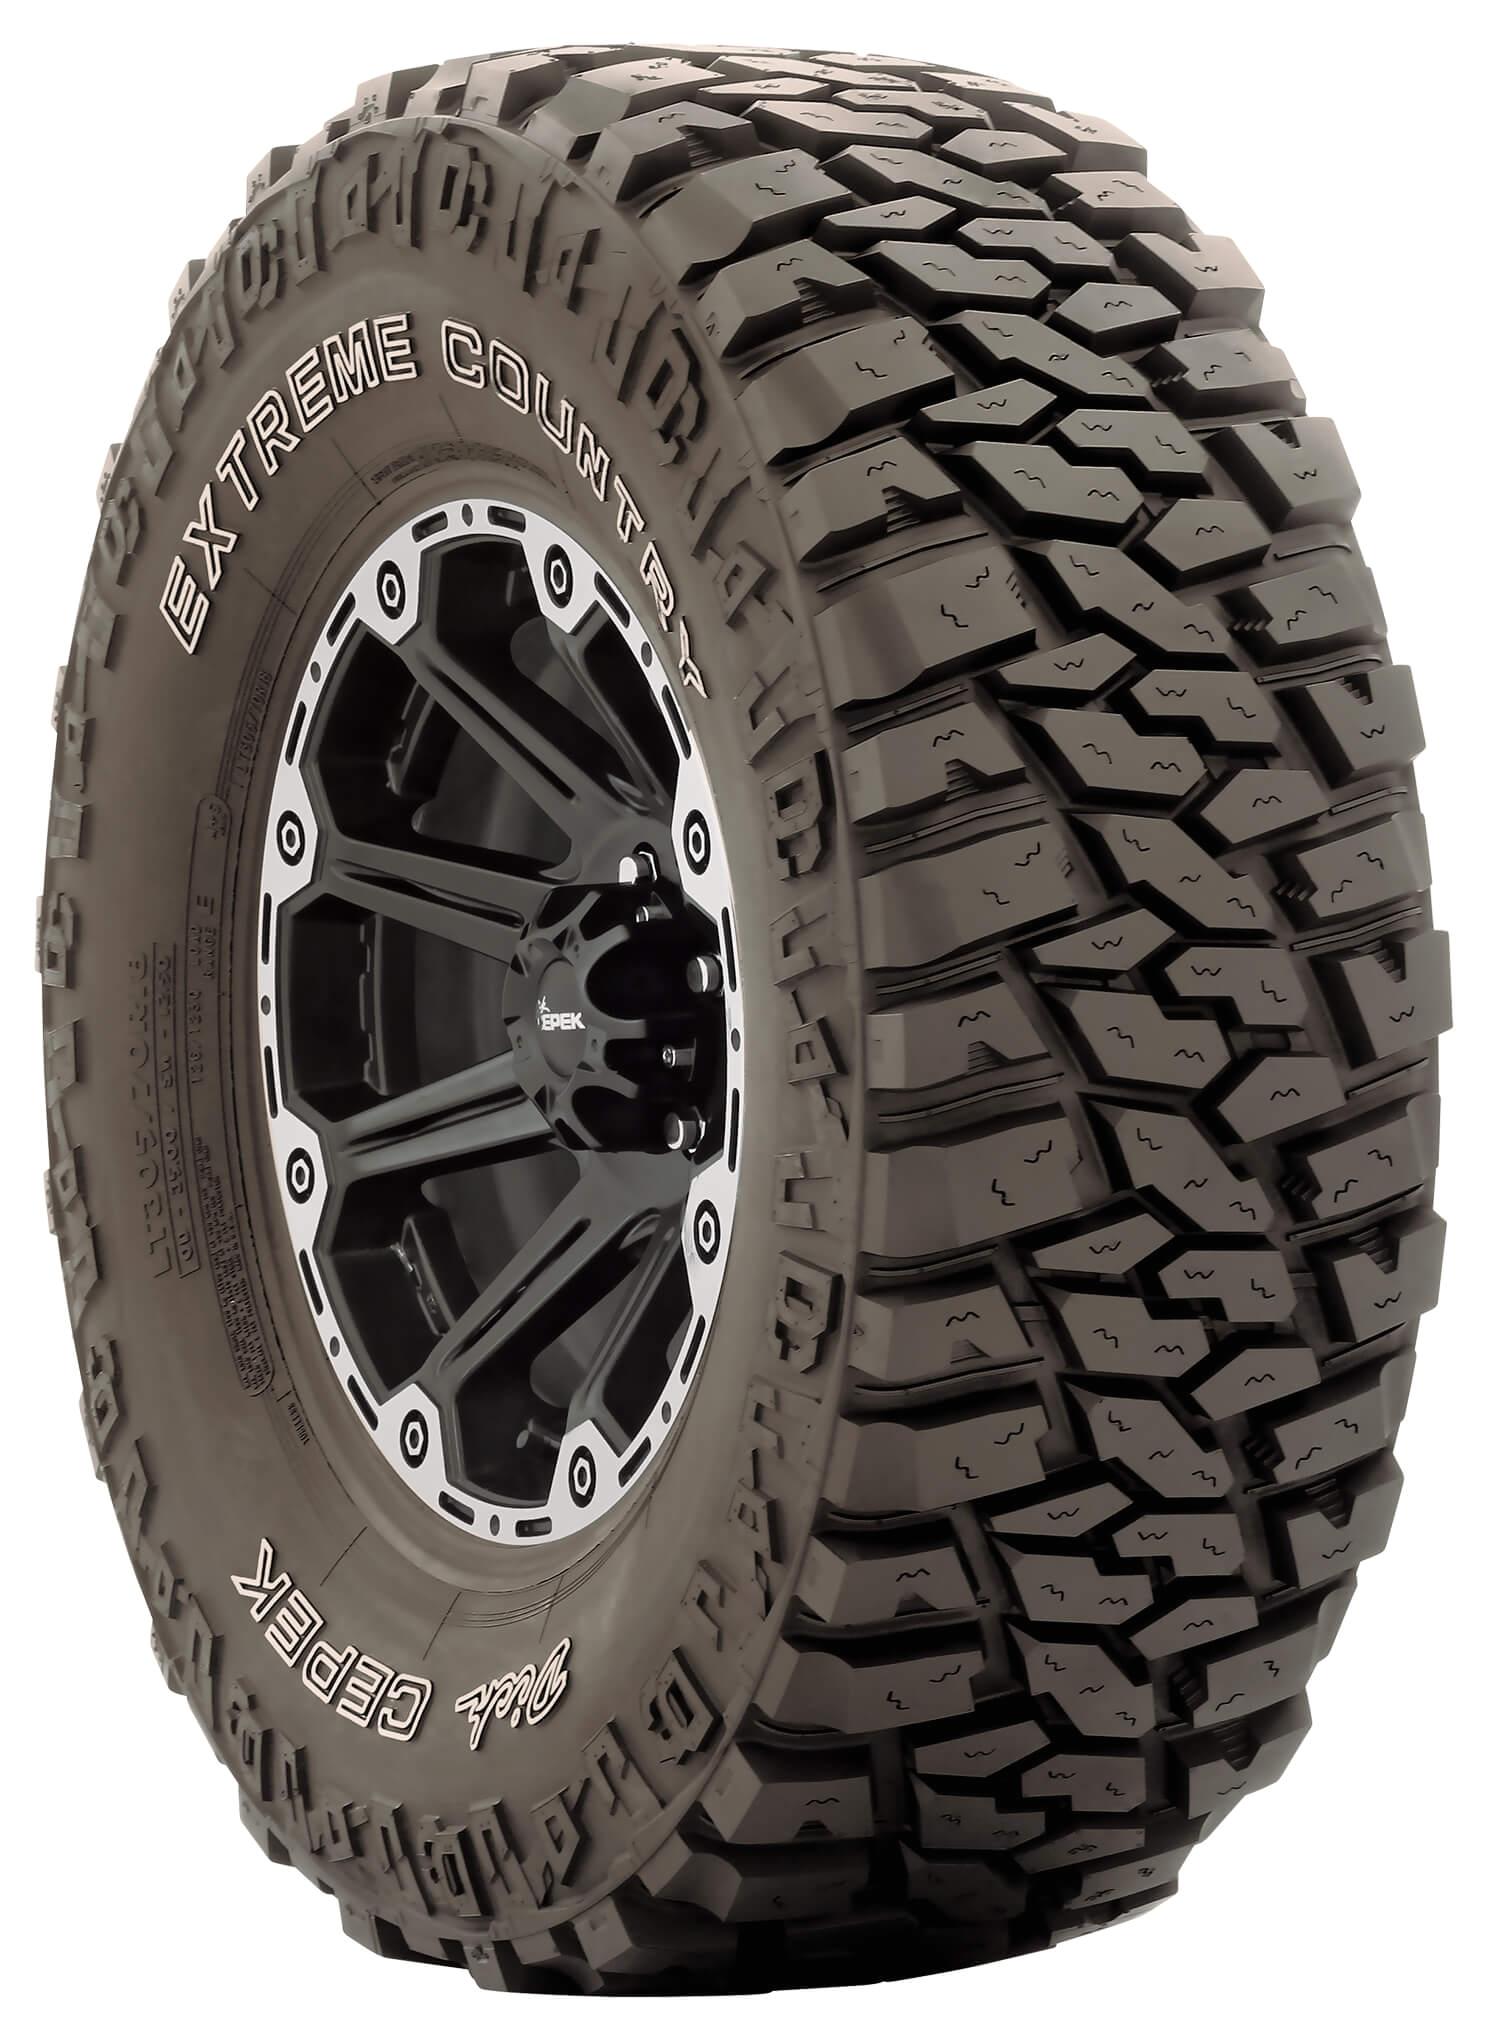 Bfgoodrich Light Truck Tires Buy Light Truck Tire Size Lt295 70r17 Performance Plus Tire